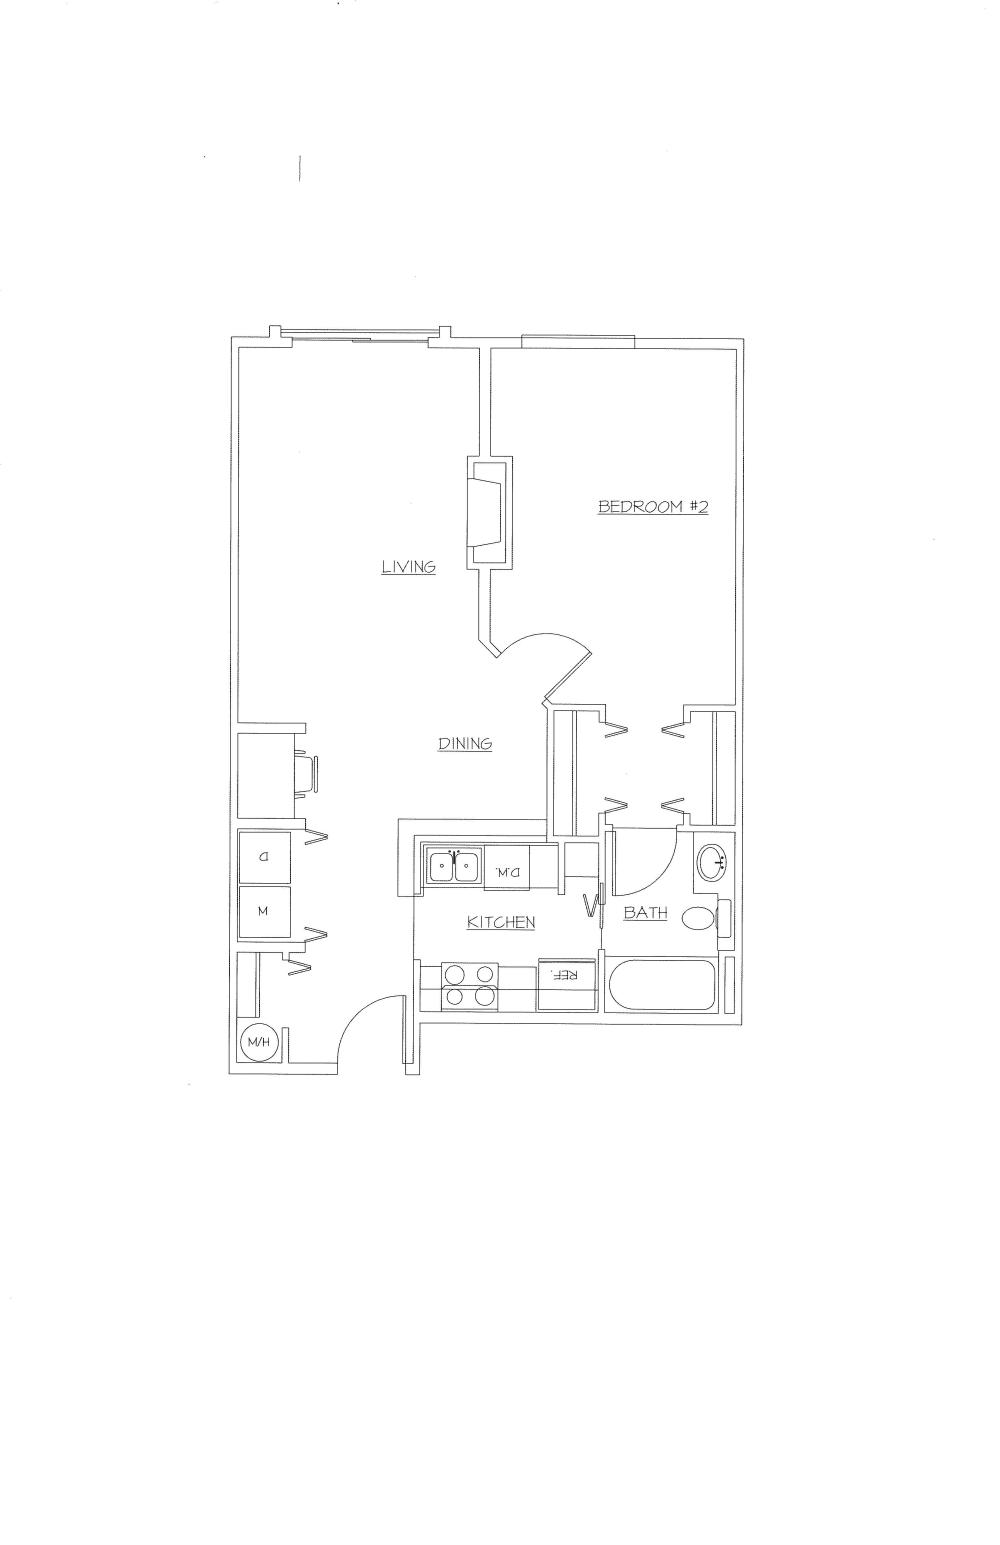 Unit E (1 Bed, 1 Bath)